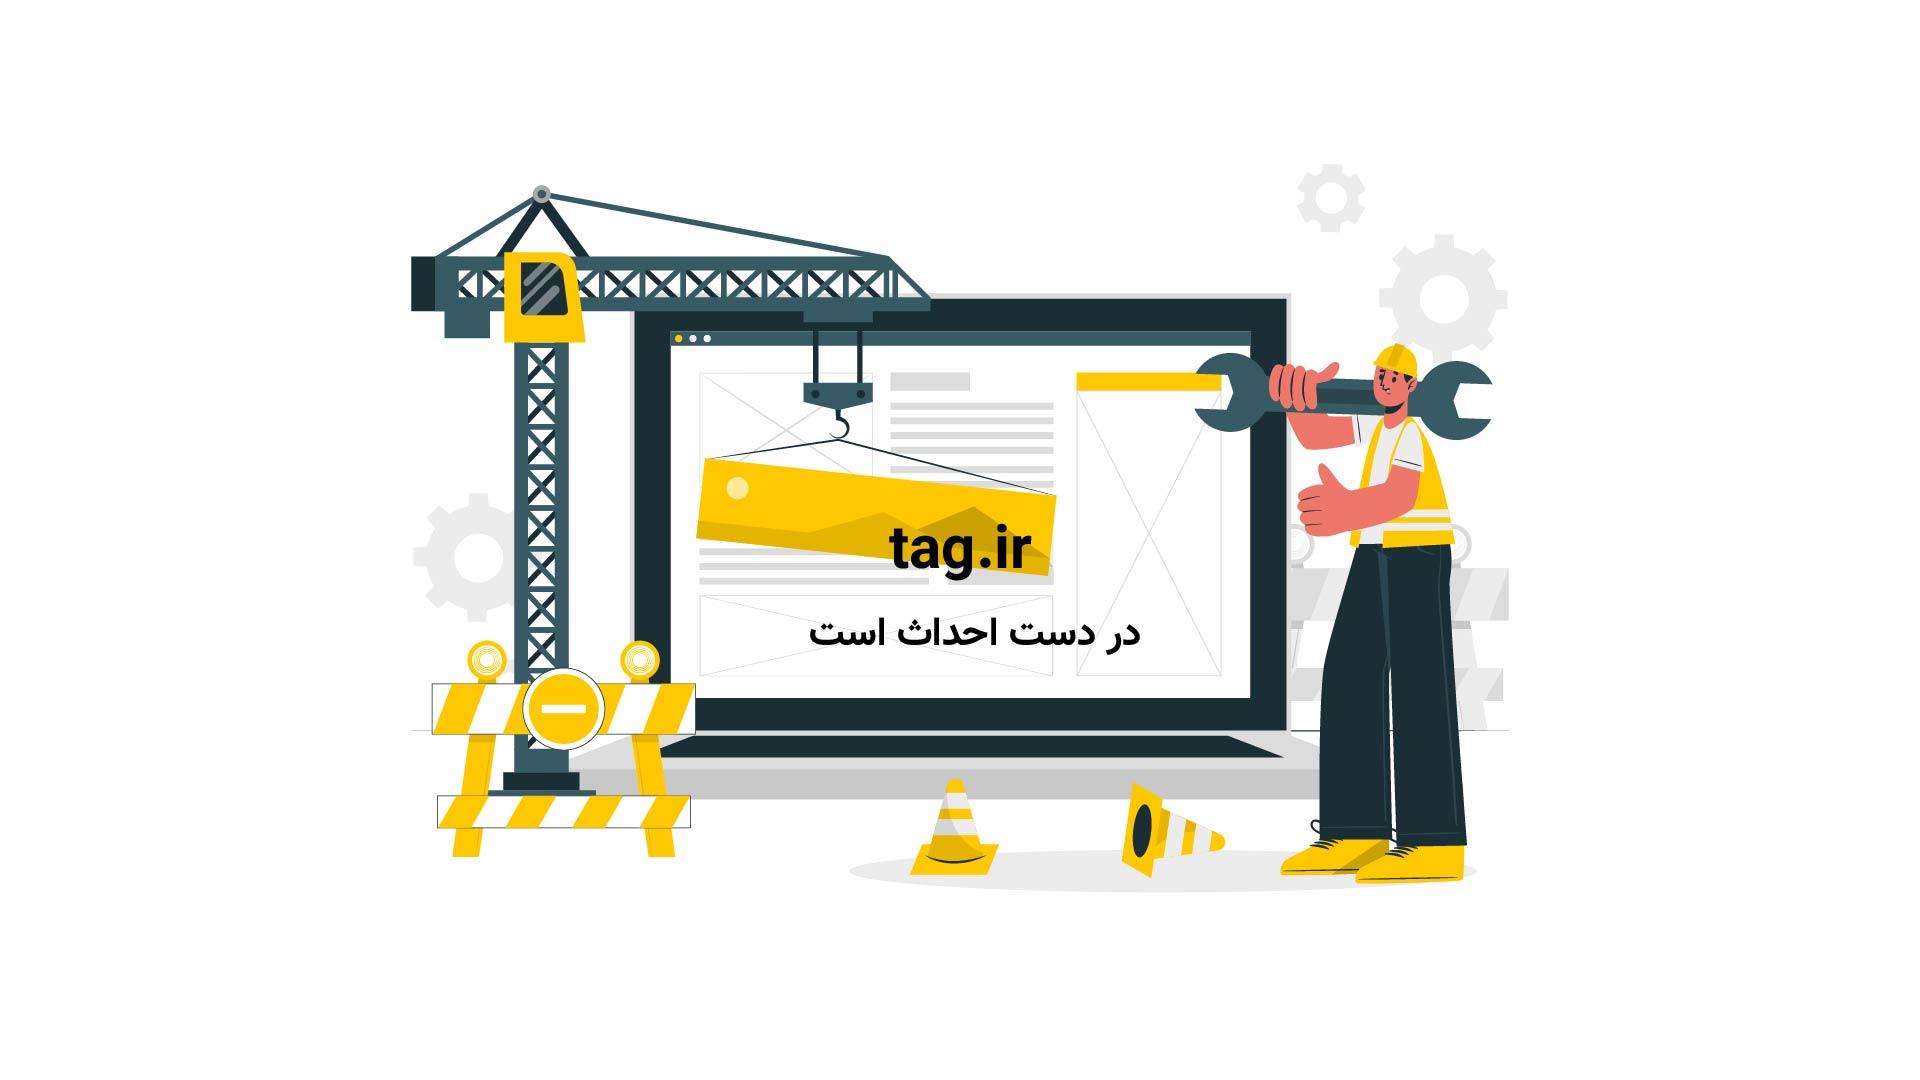 سکانس برتر فیلم شوالیه تاریکی | فیلم